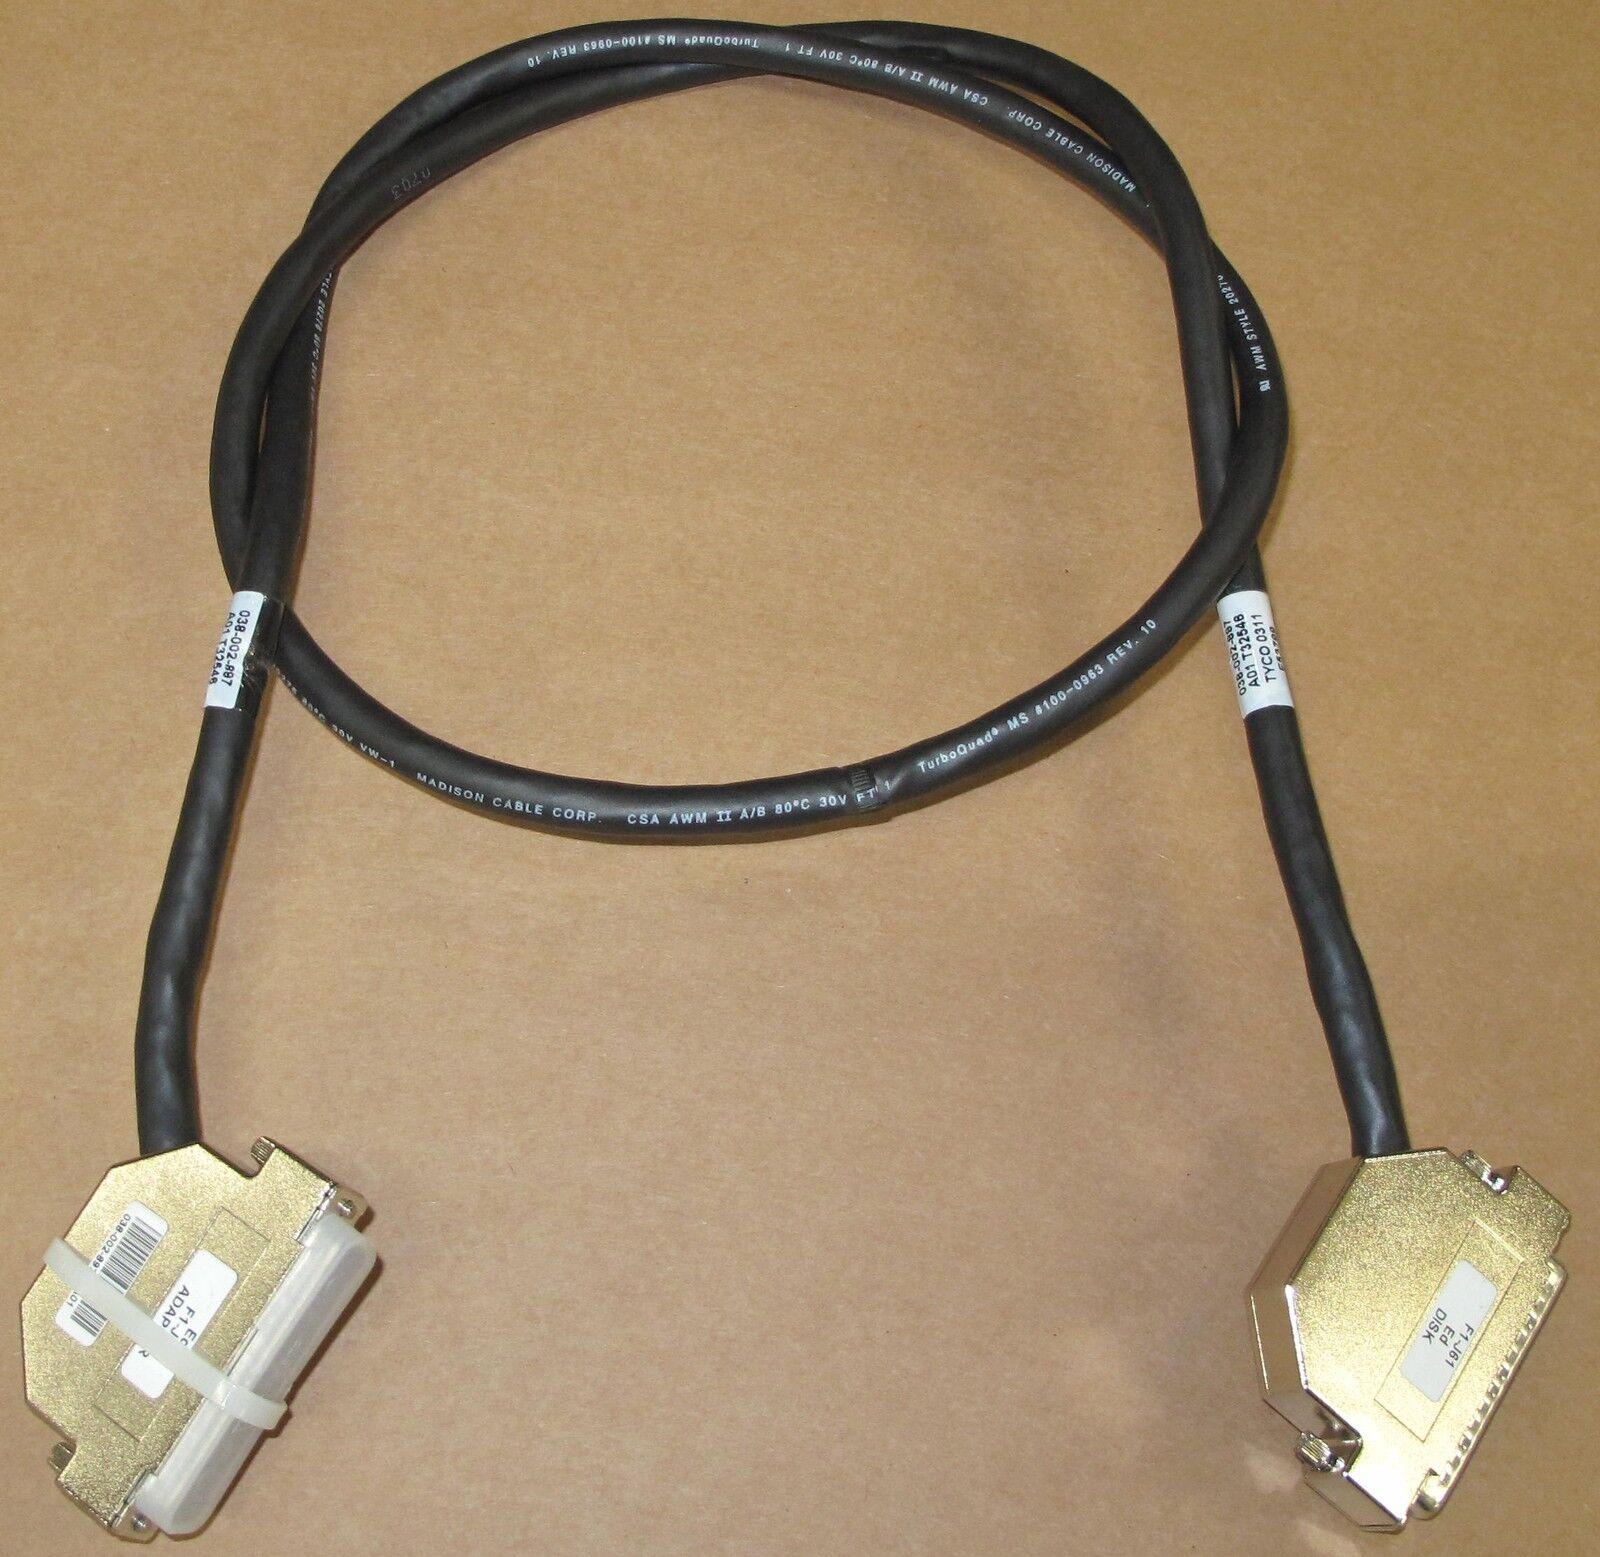 EMC ED TO F1-J51 Fibre Channel Cable 038-002-897 Symmetrix RAID Array Network